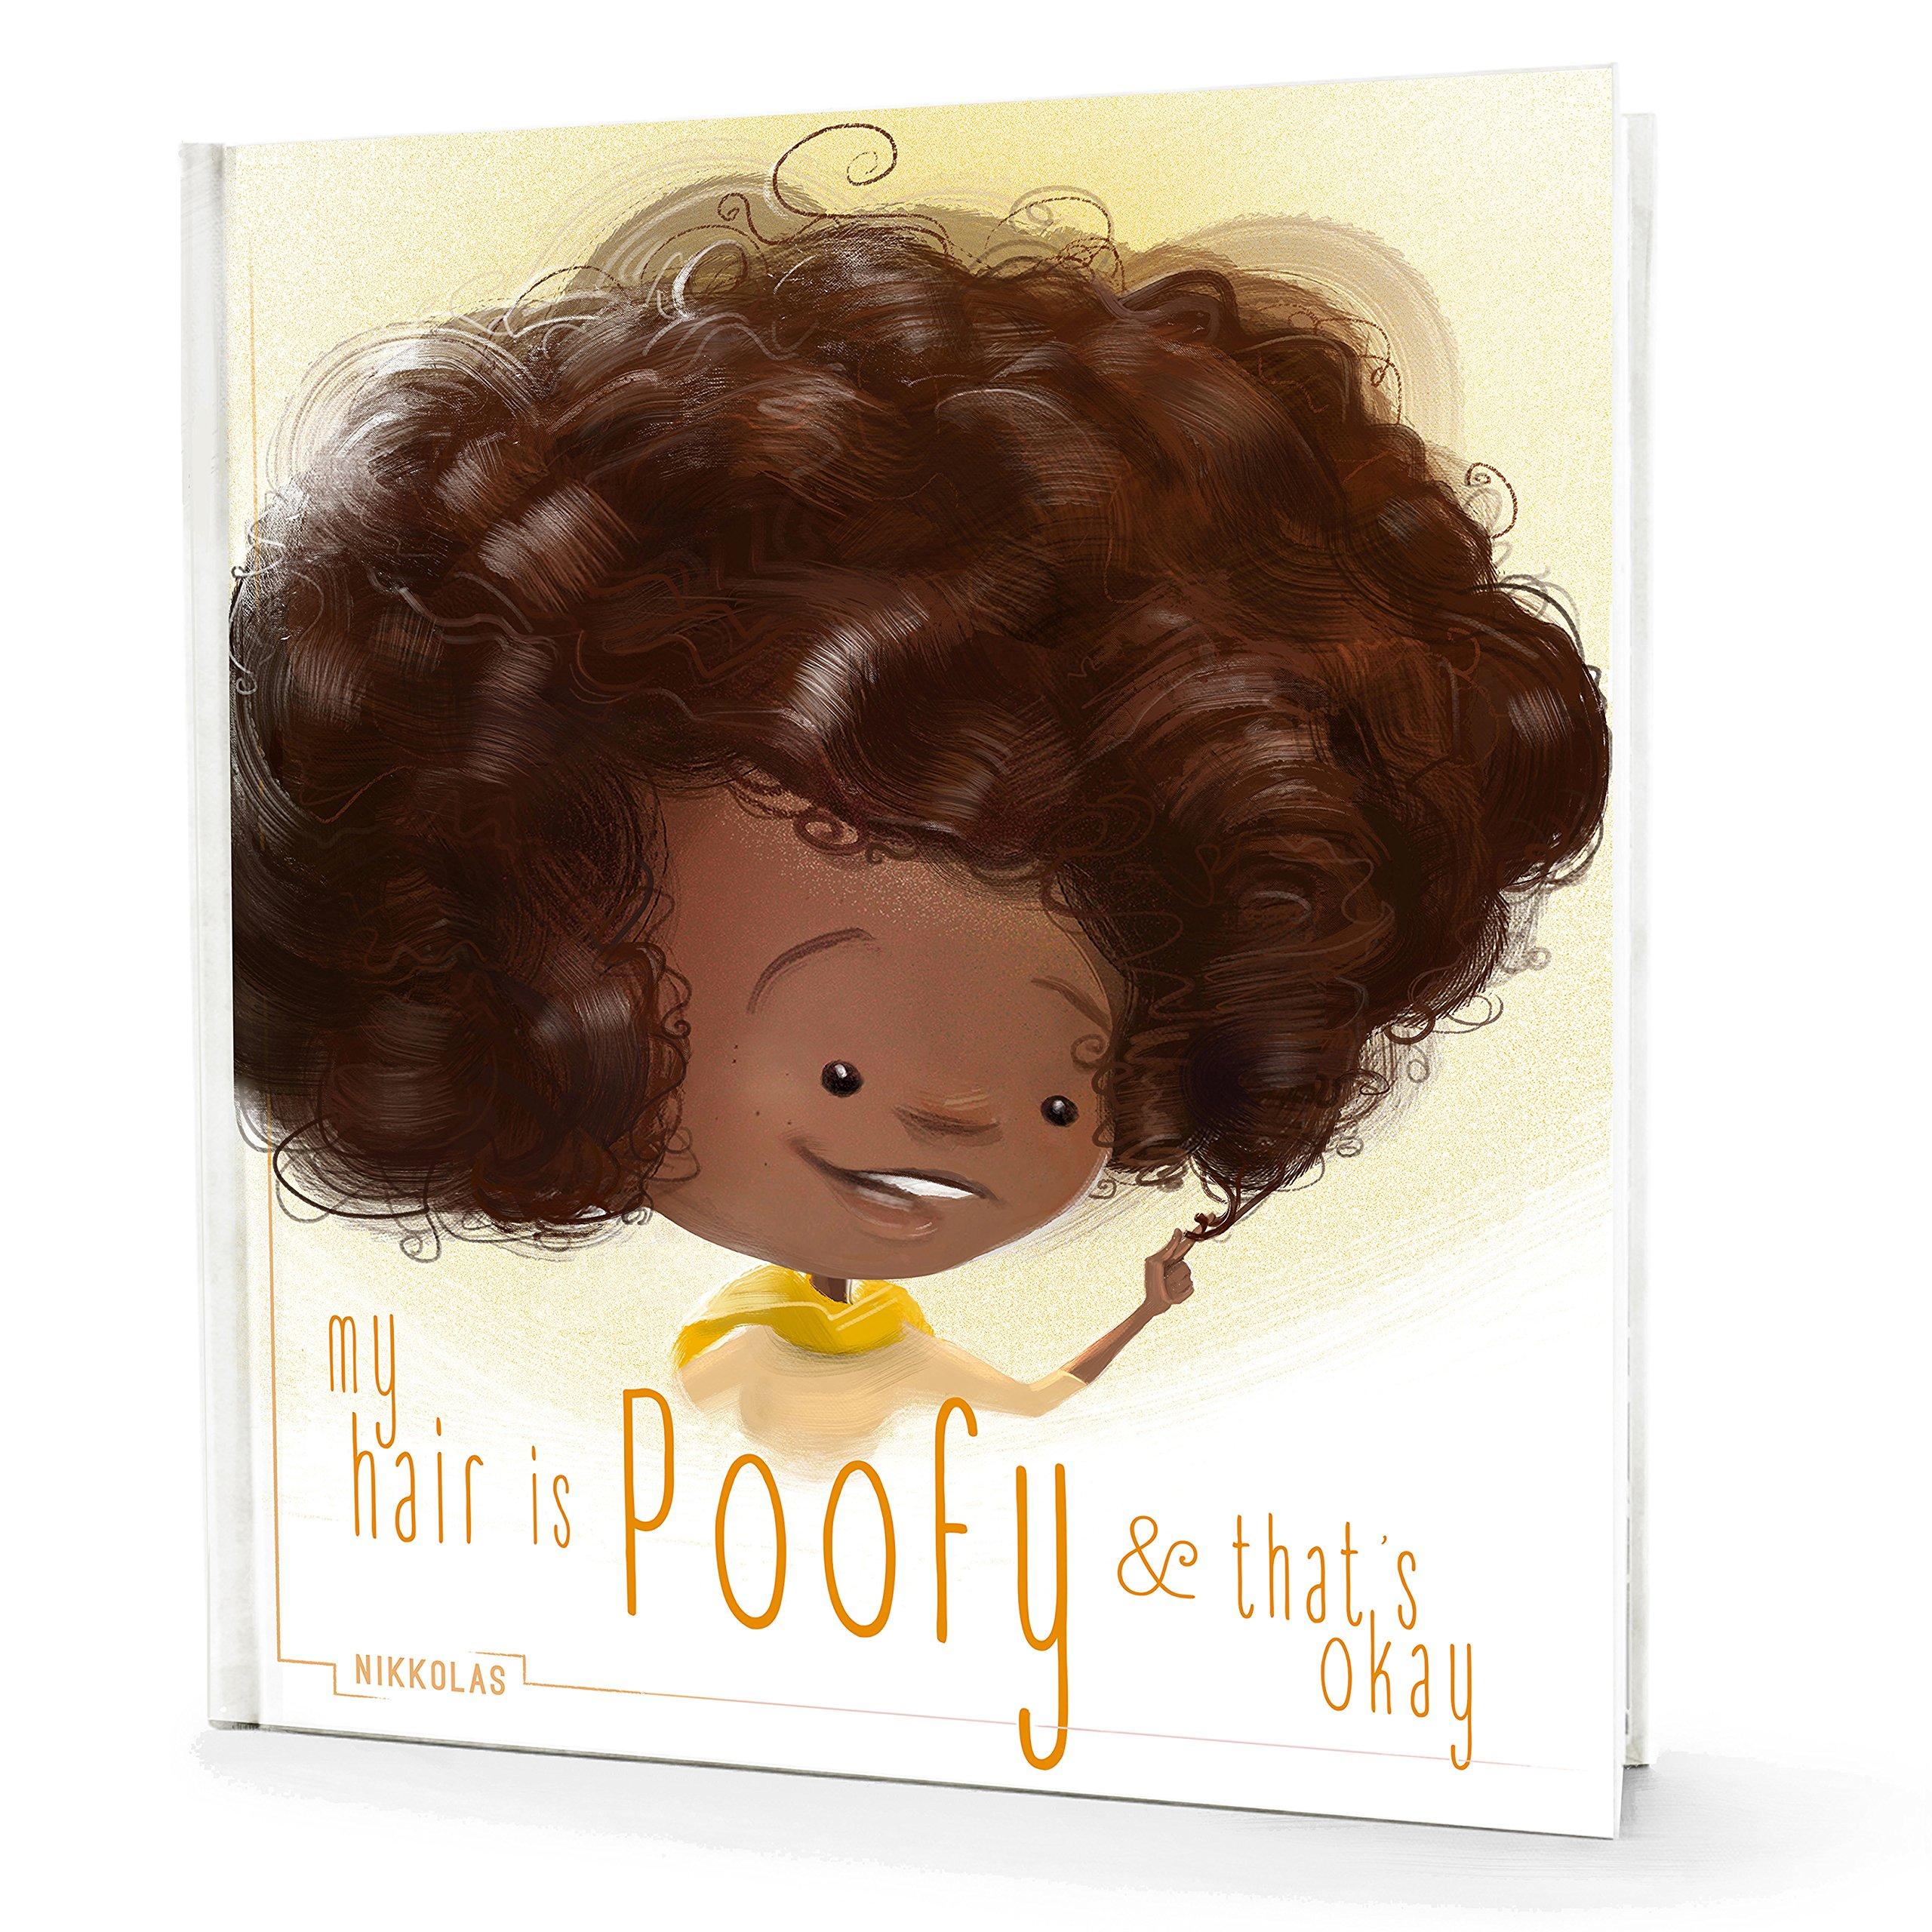 20 Latest Curly Hair Cartoon Characters With Poofy Hair Jessau